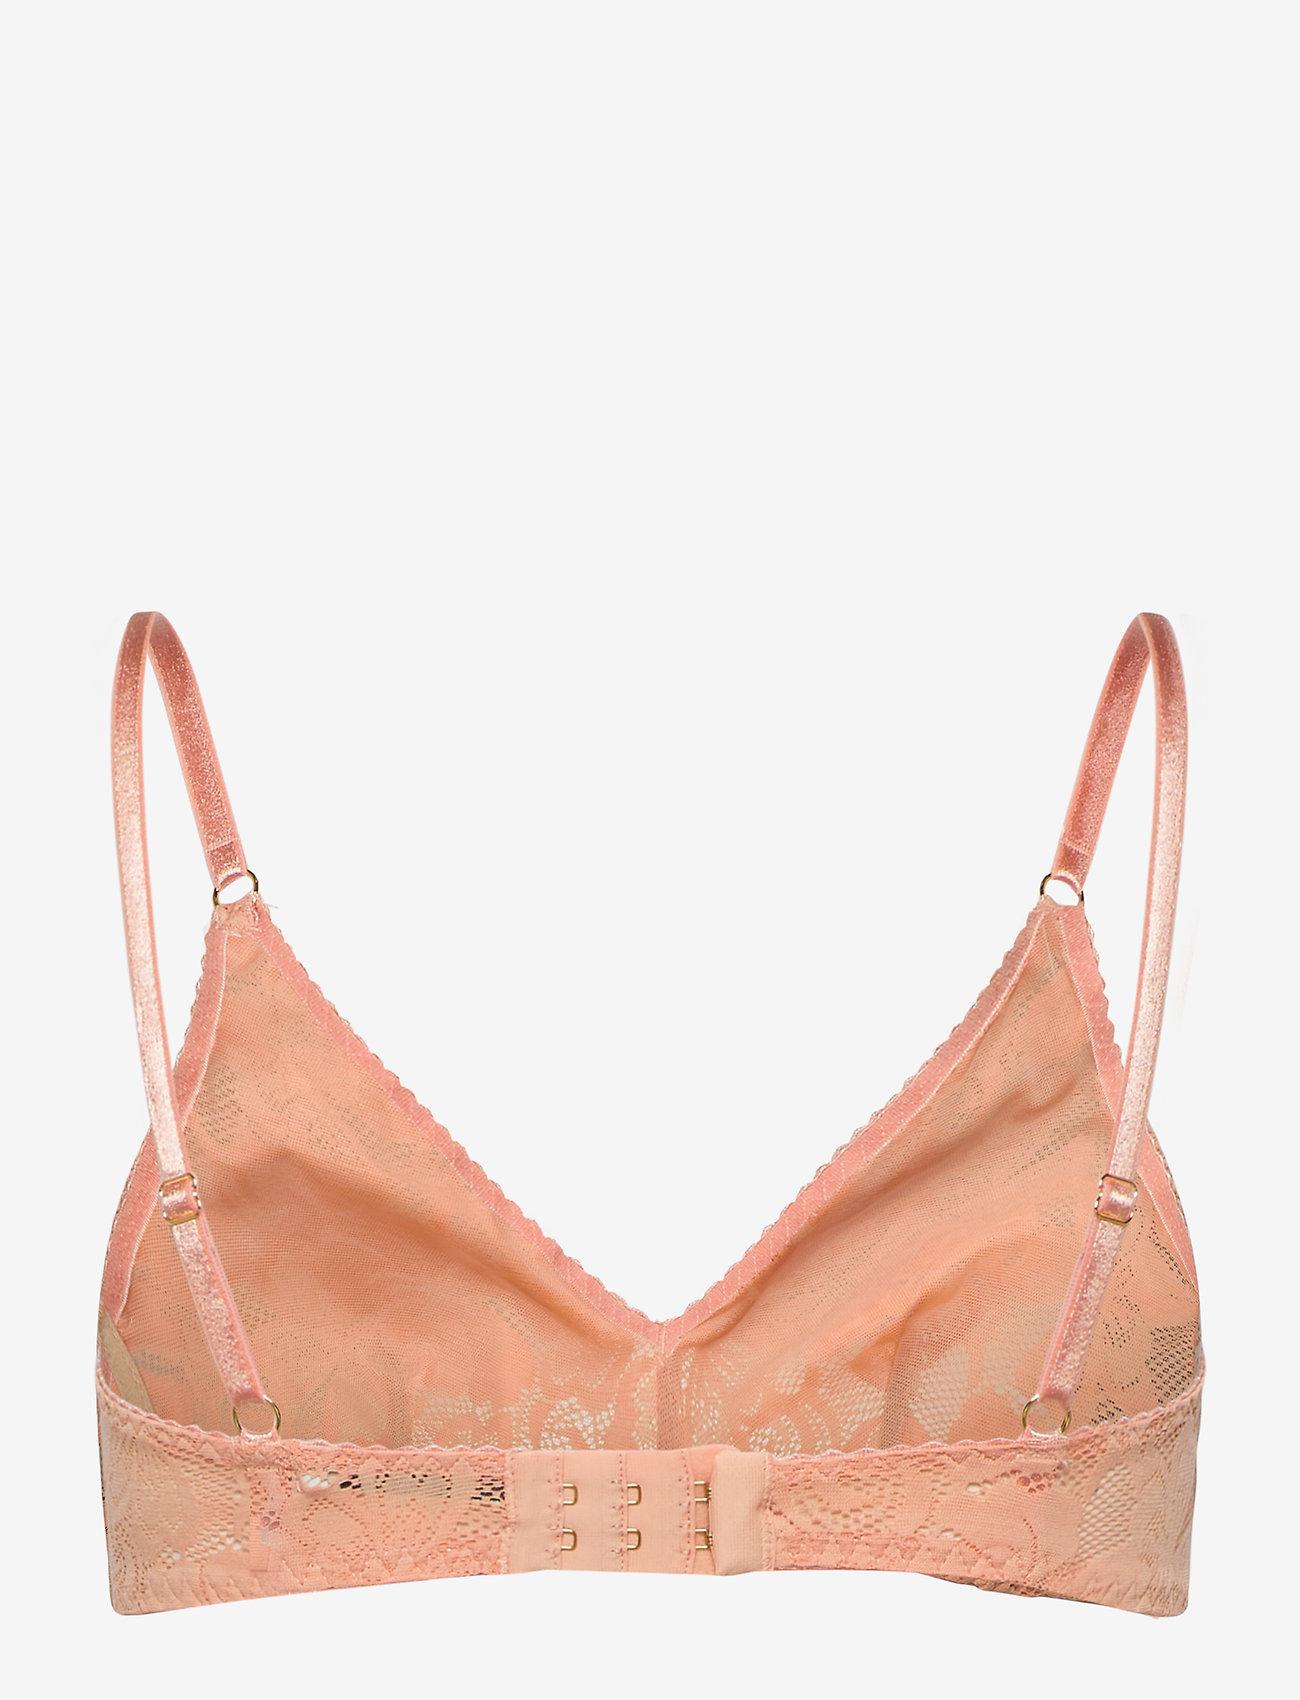 Underprotection - Ruby bra - soutien-gorge souple - rose - 1